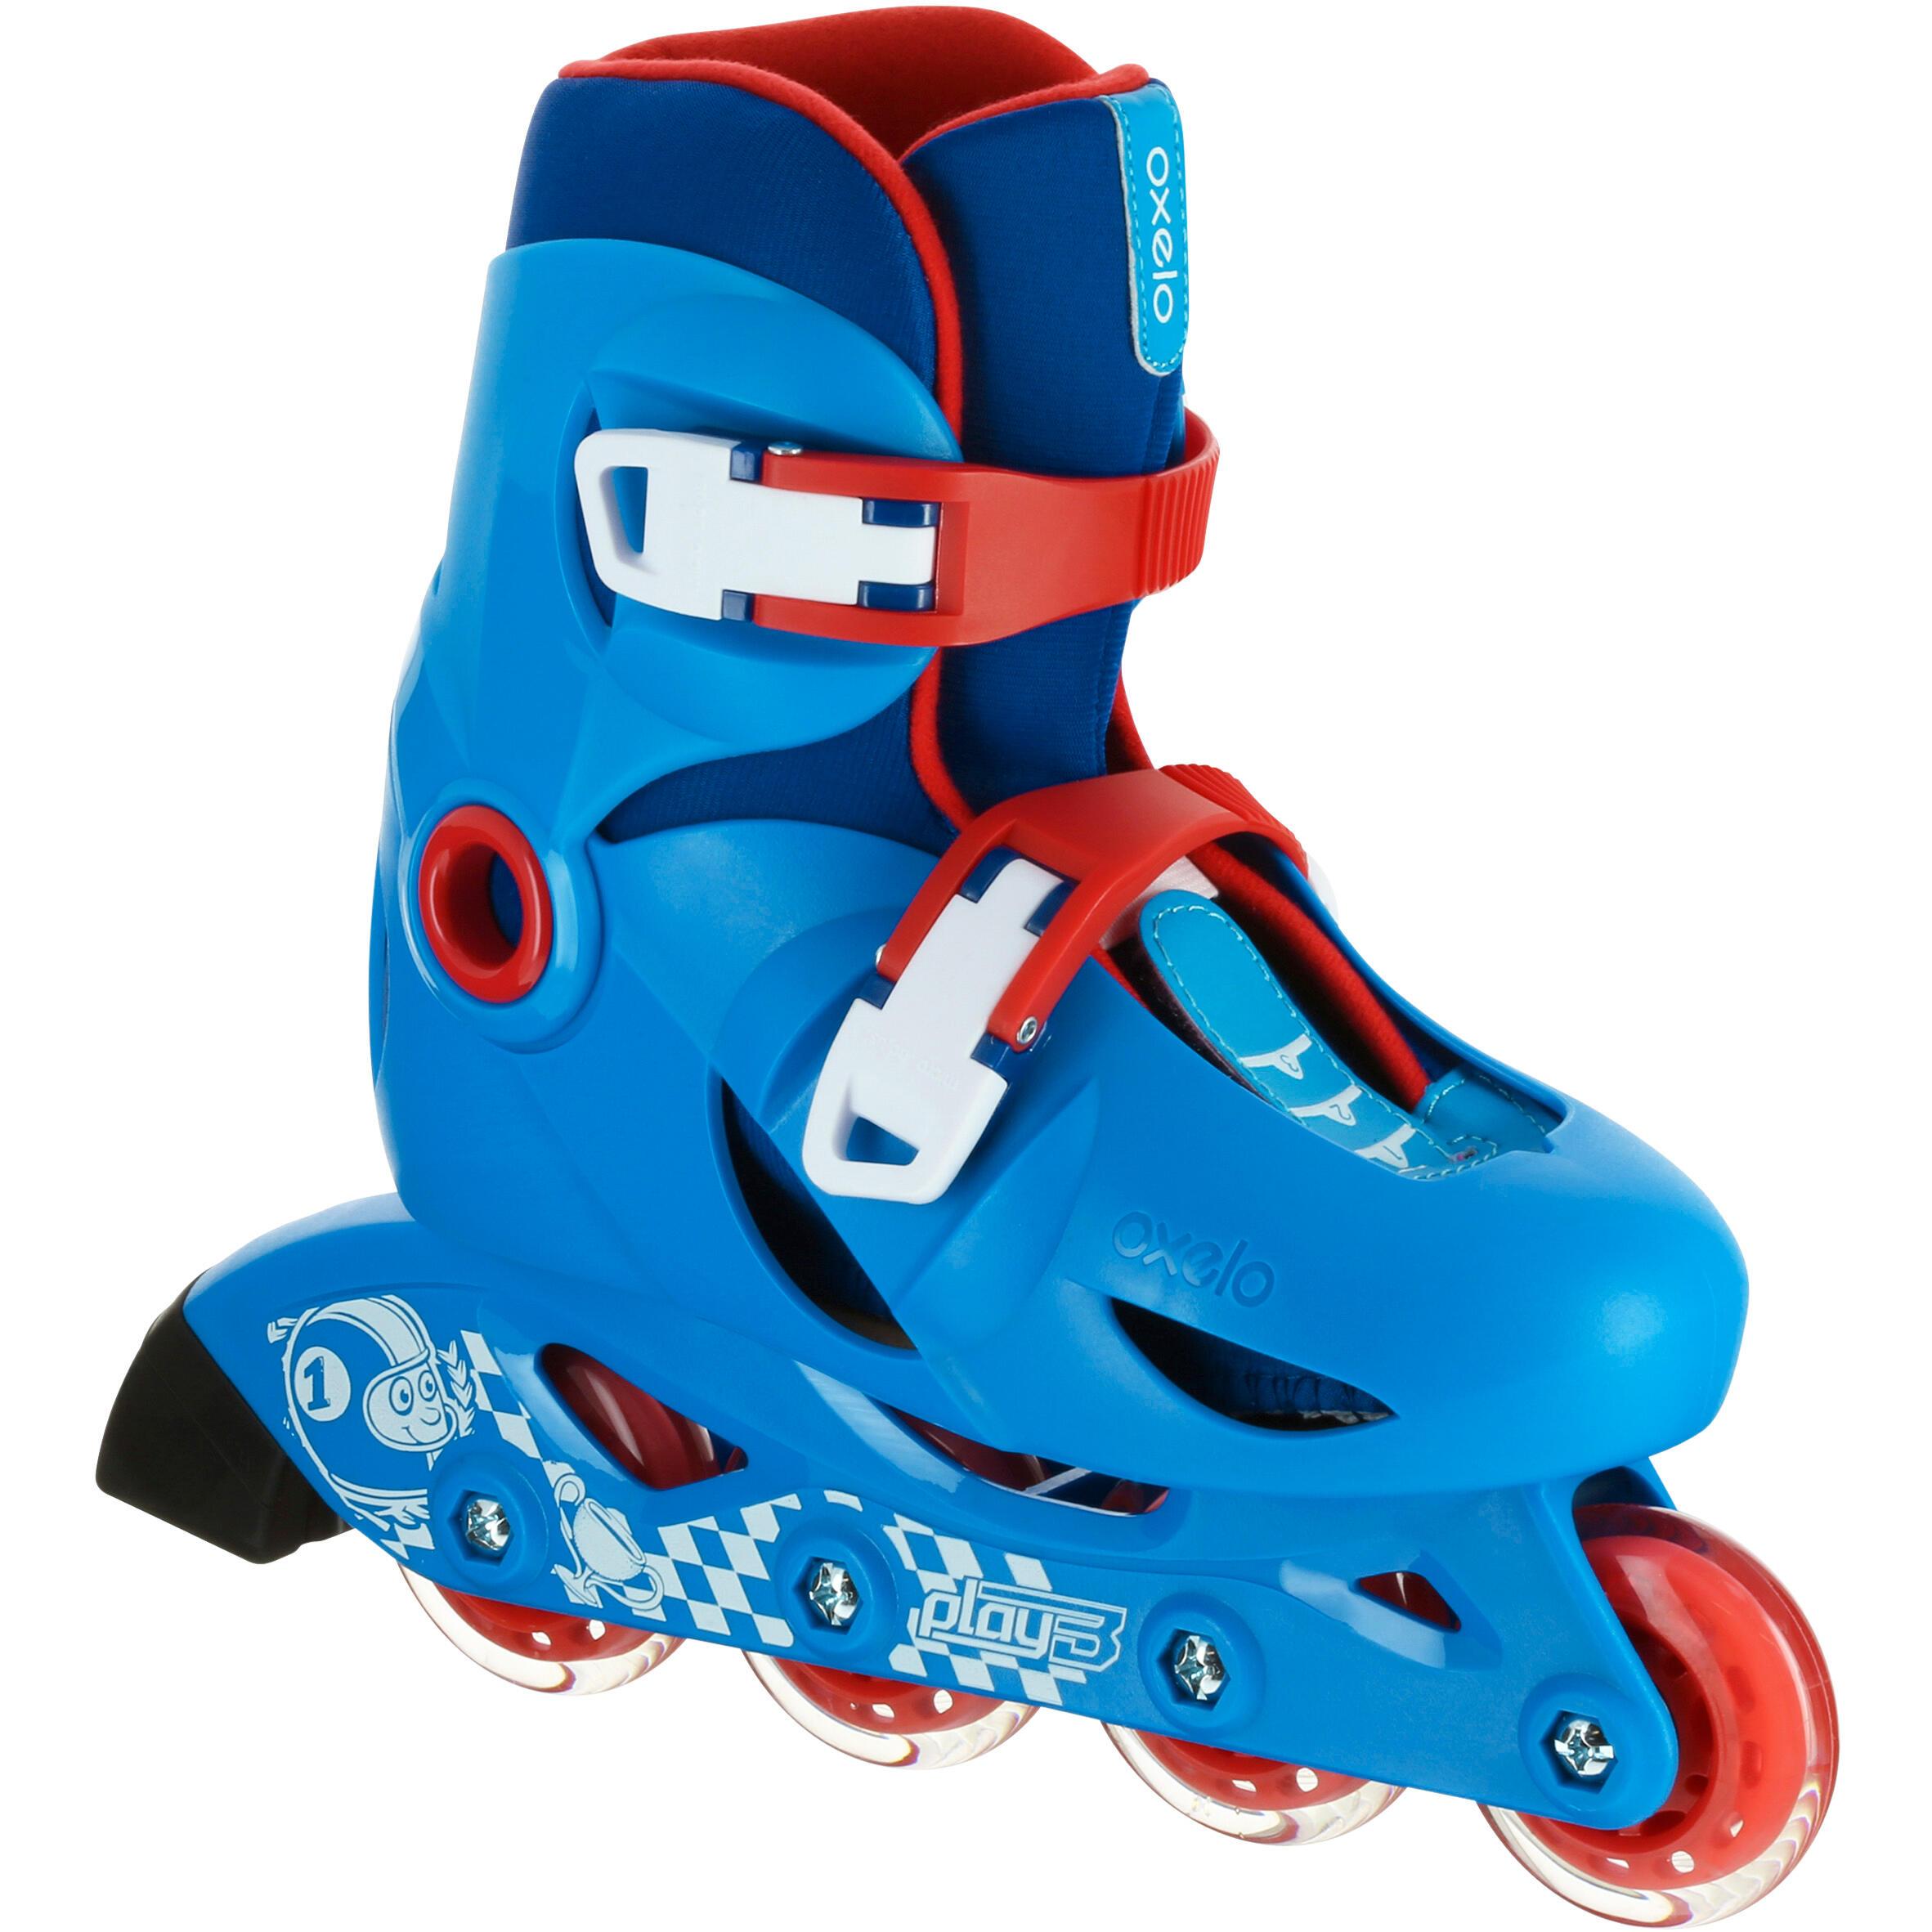 Play 3 Kids' Inline Skates - Blue/Red